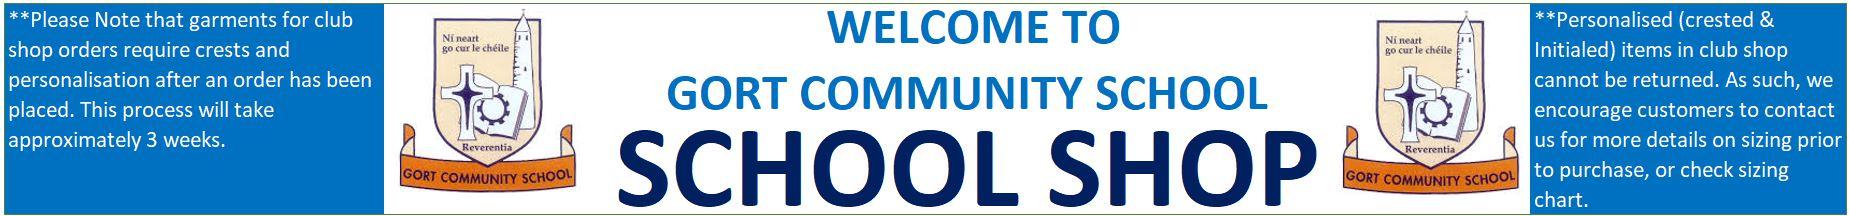 Gort Community School